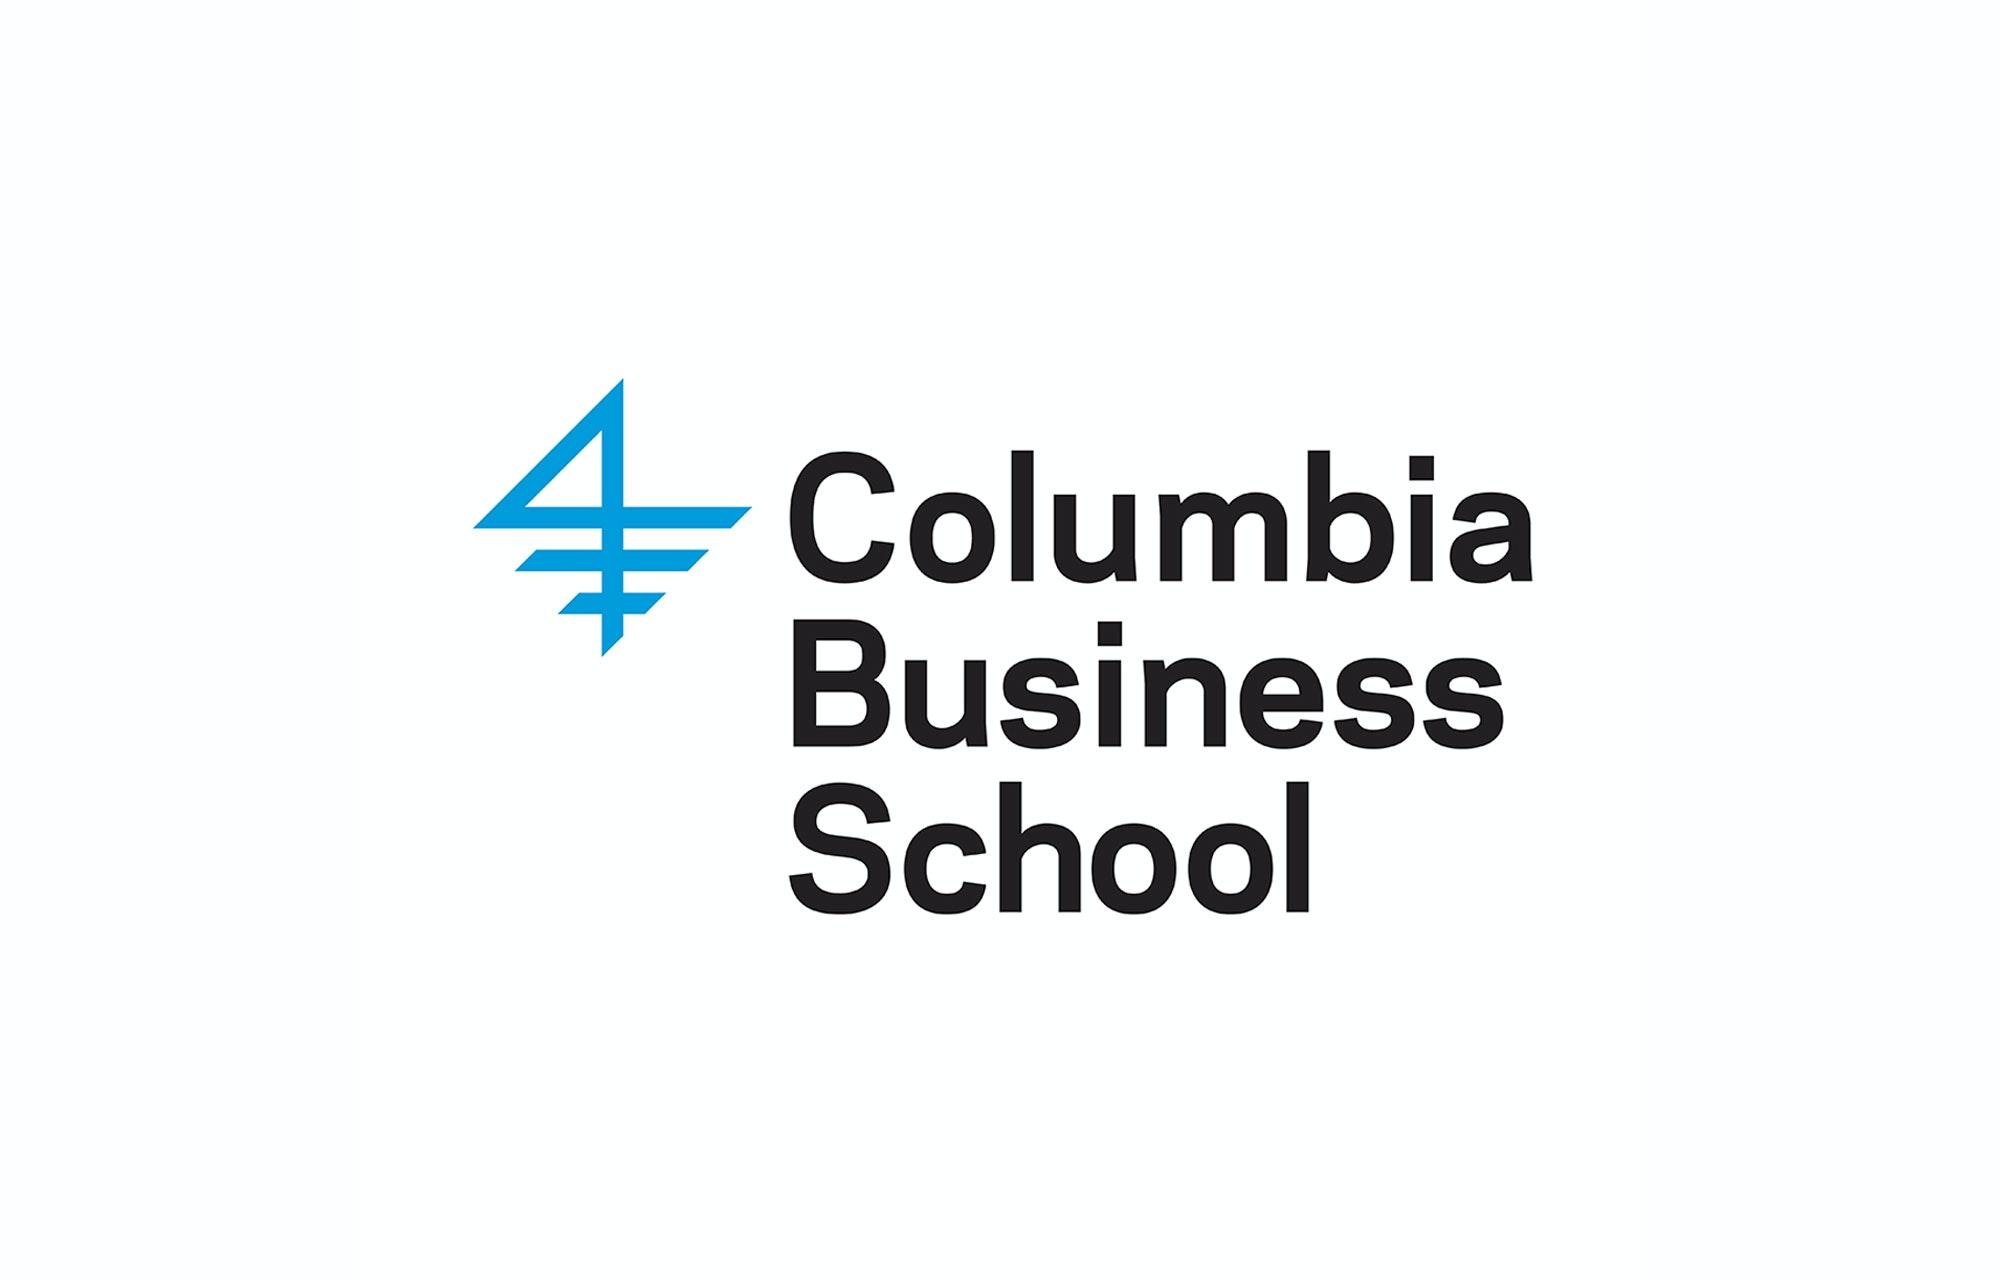 columbia business school  u2014 story  u2014 pentagram